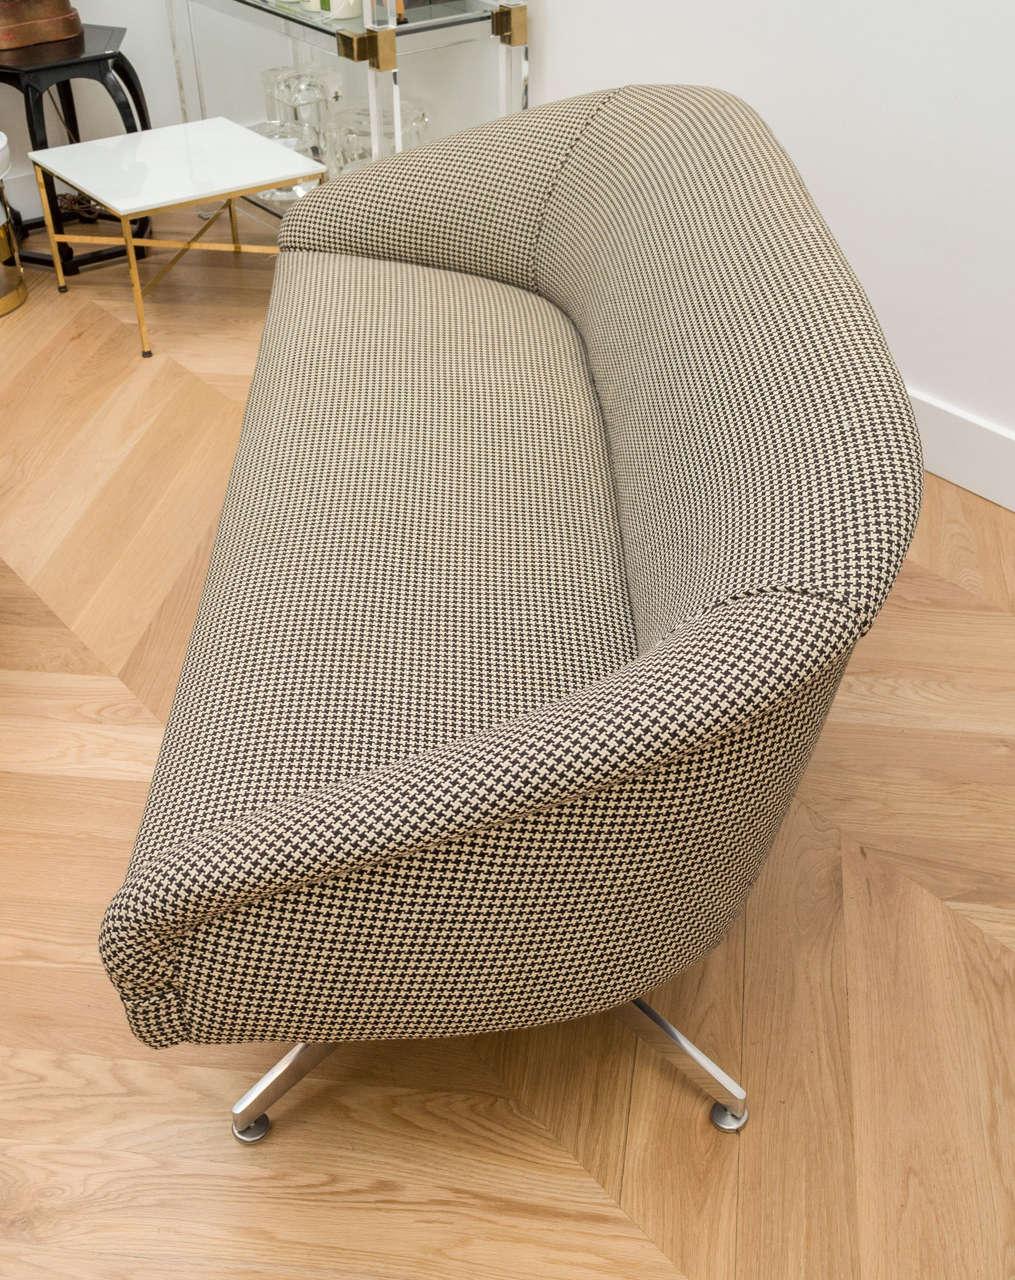 Ward Bennett Sofa with Original Wool Houndstooth Fabric 6